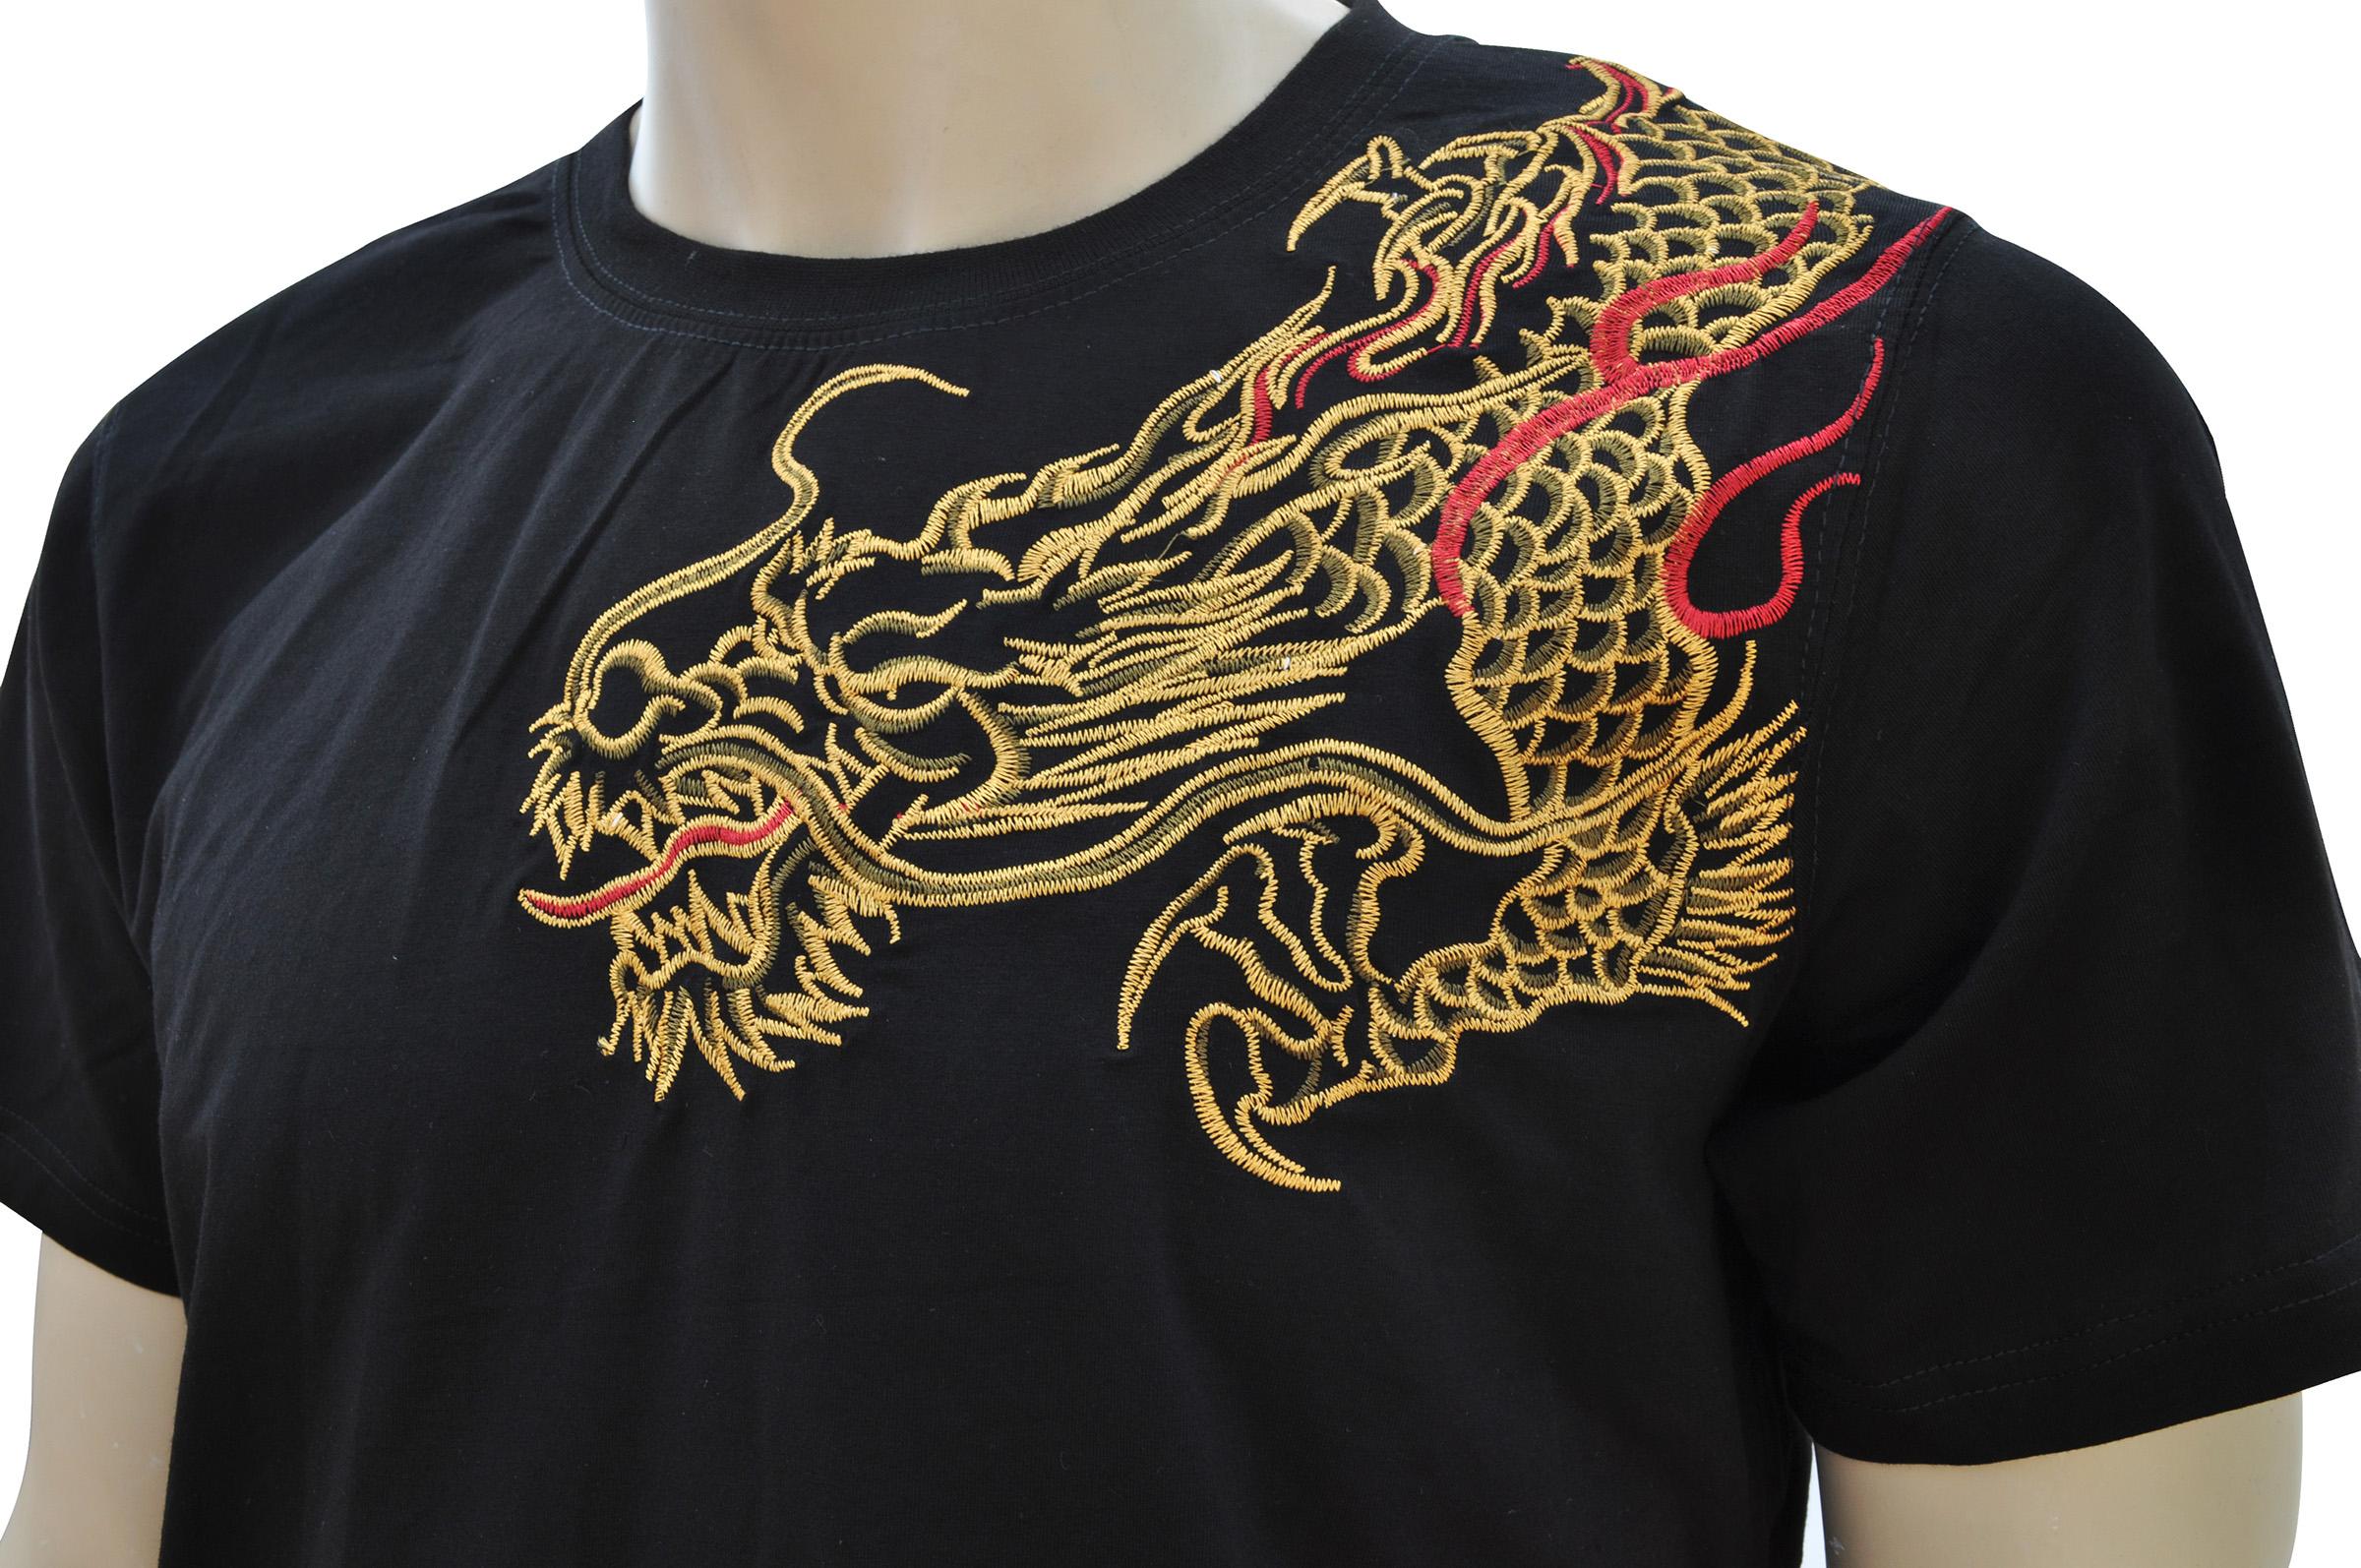 0e4299f47fad9 T-shirt Dragon brodé 3 - DragonSports.eu